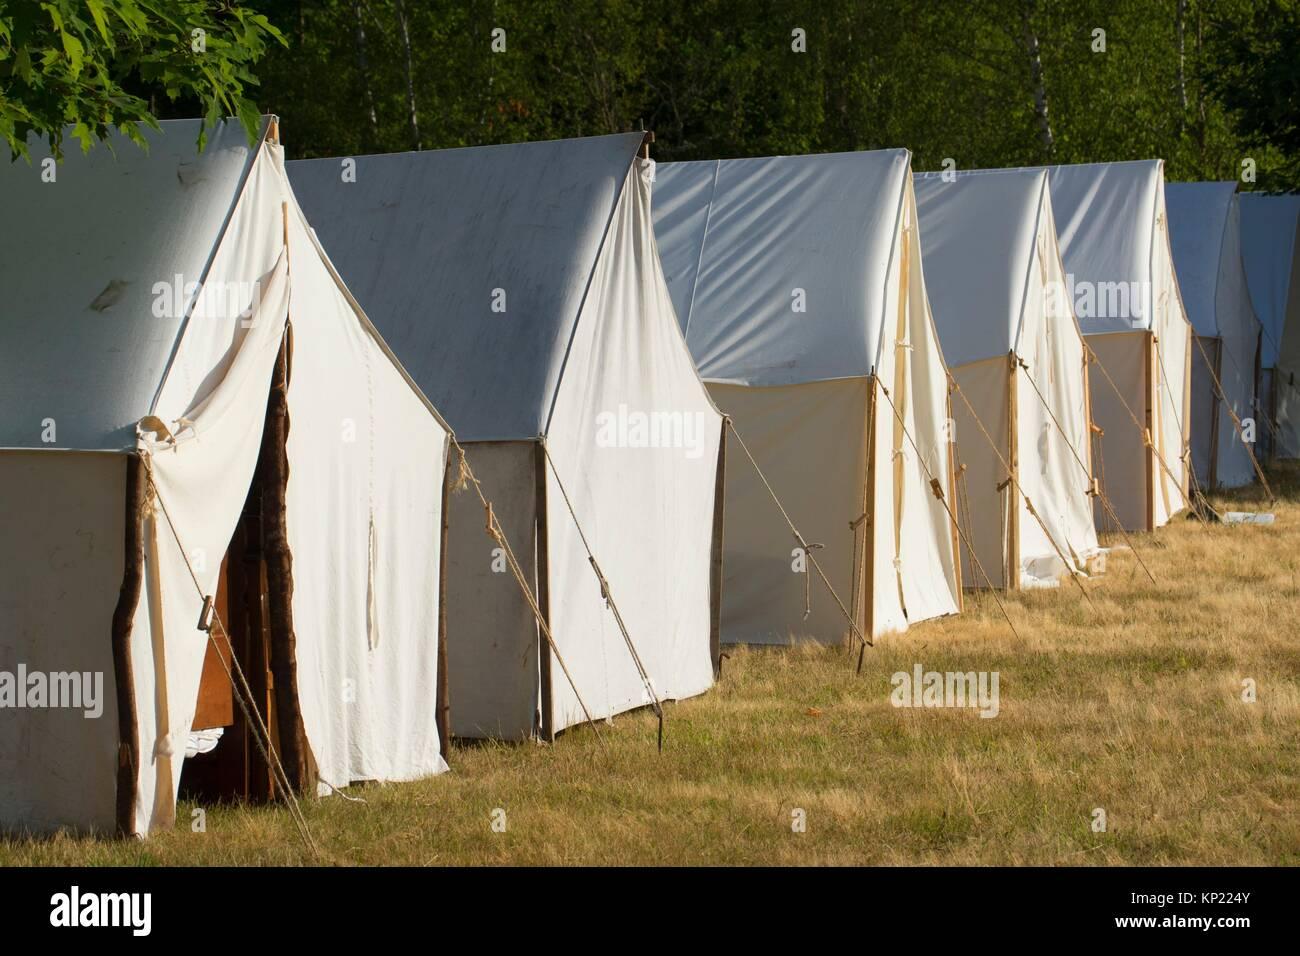 Camp Zelte, Bürgerkrieg Re-enactment, Willamette Mission State Park, Oregon. Stockbild